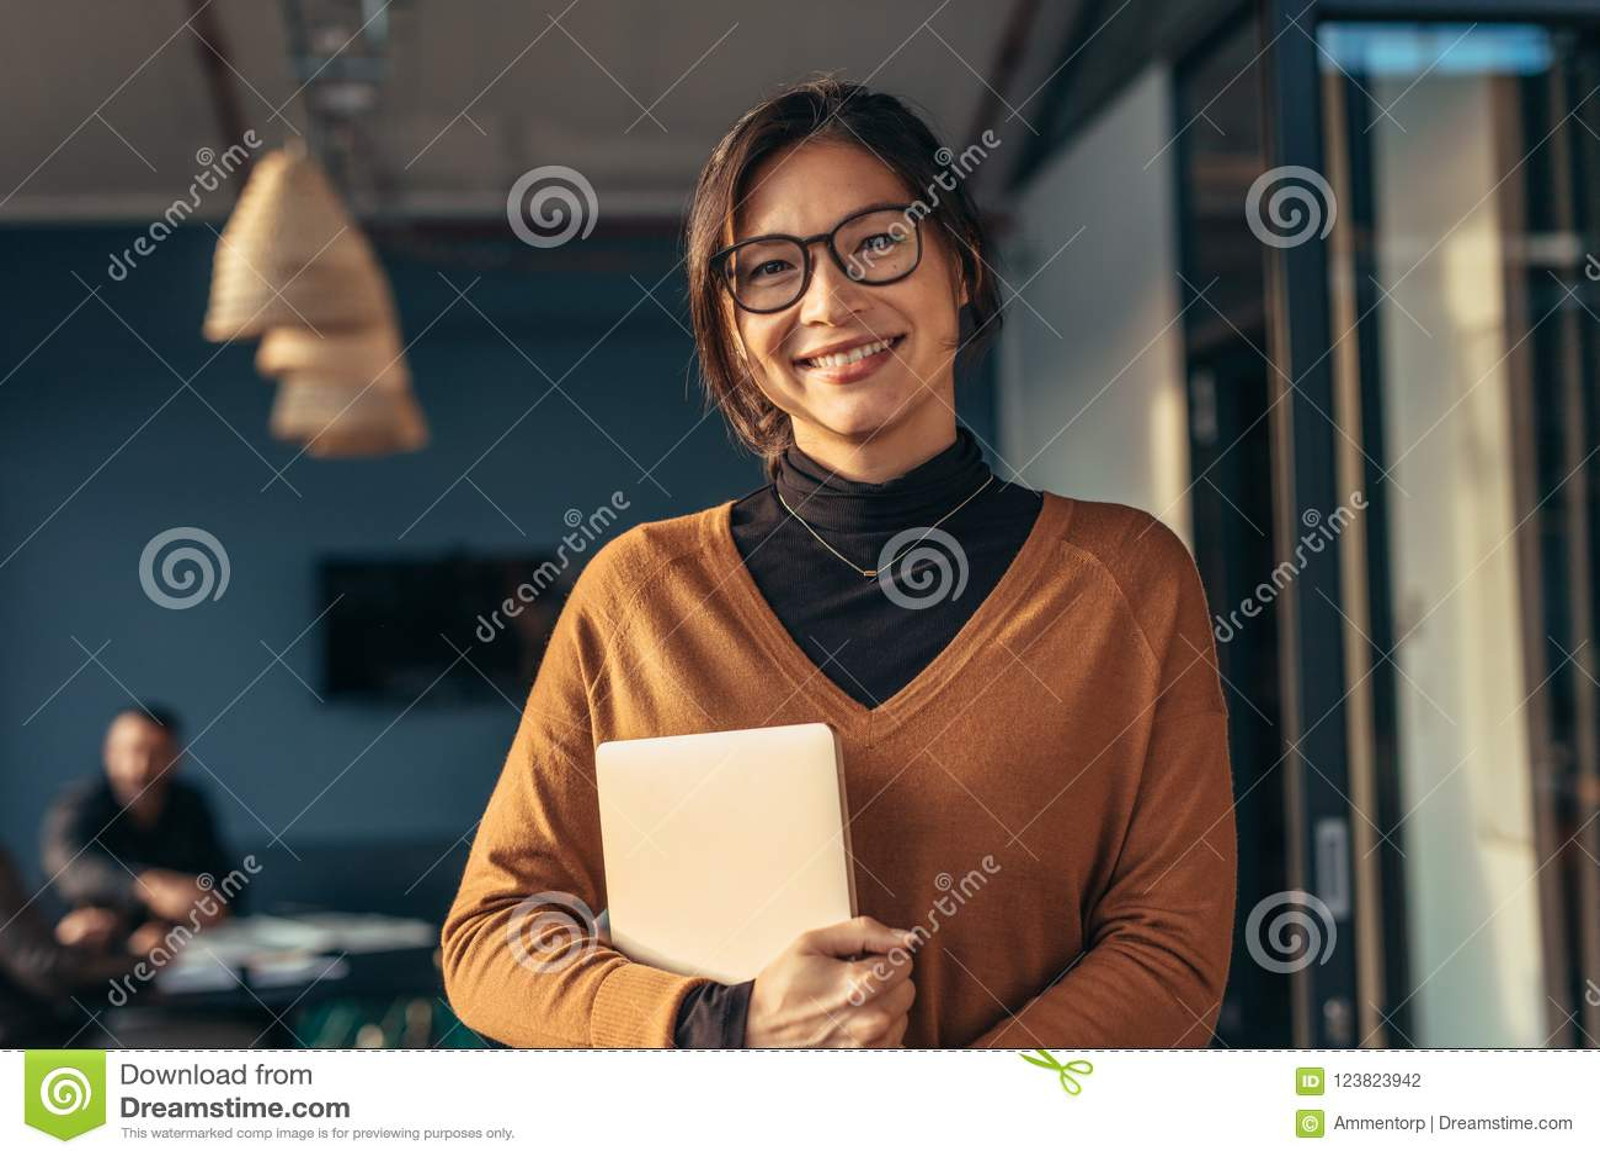 Glimlachende vrouw in toevallig in bureau